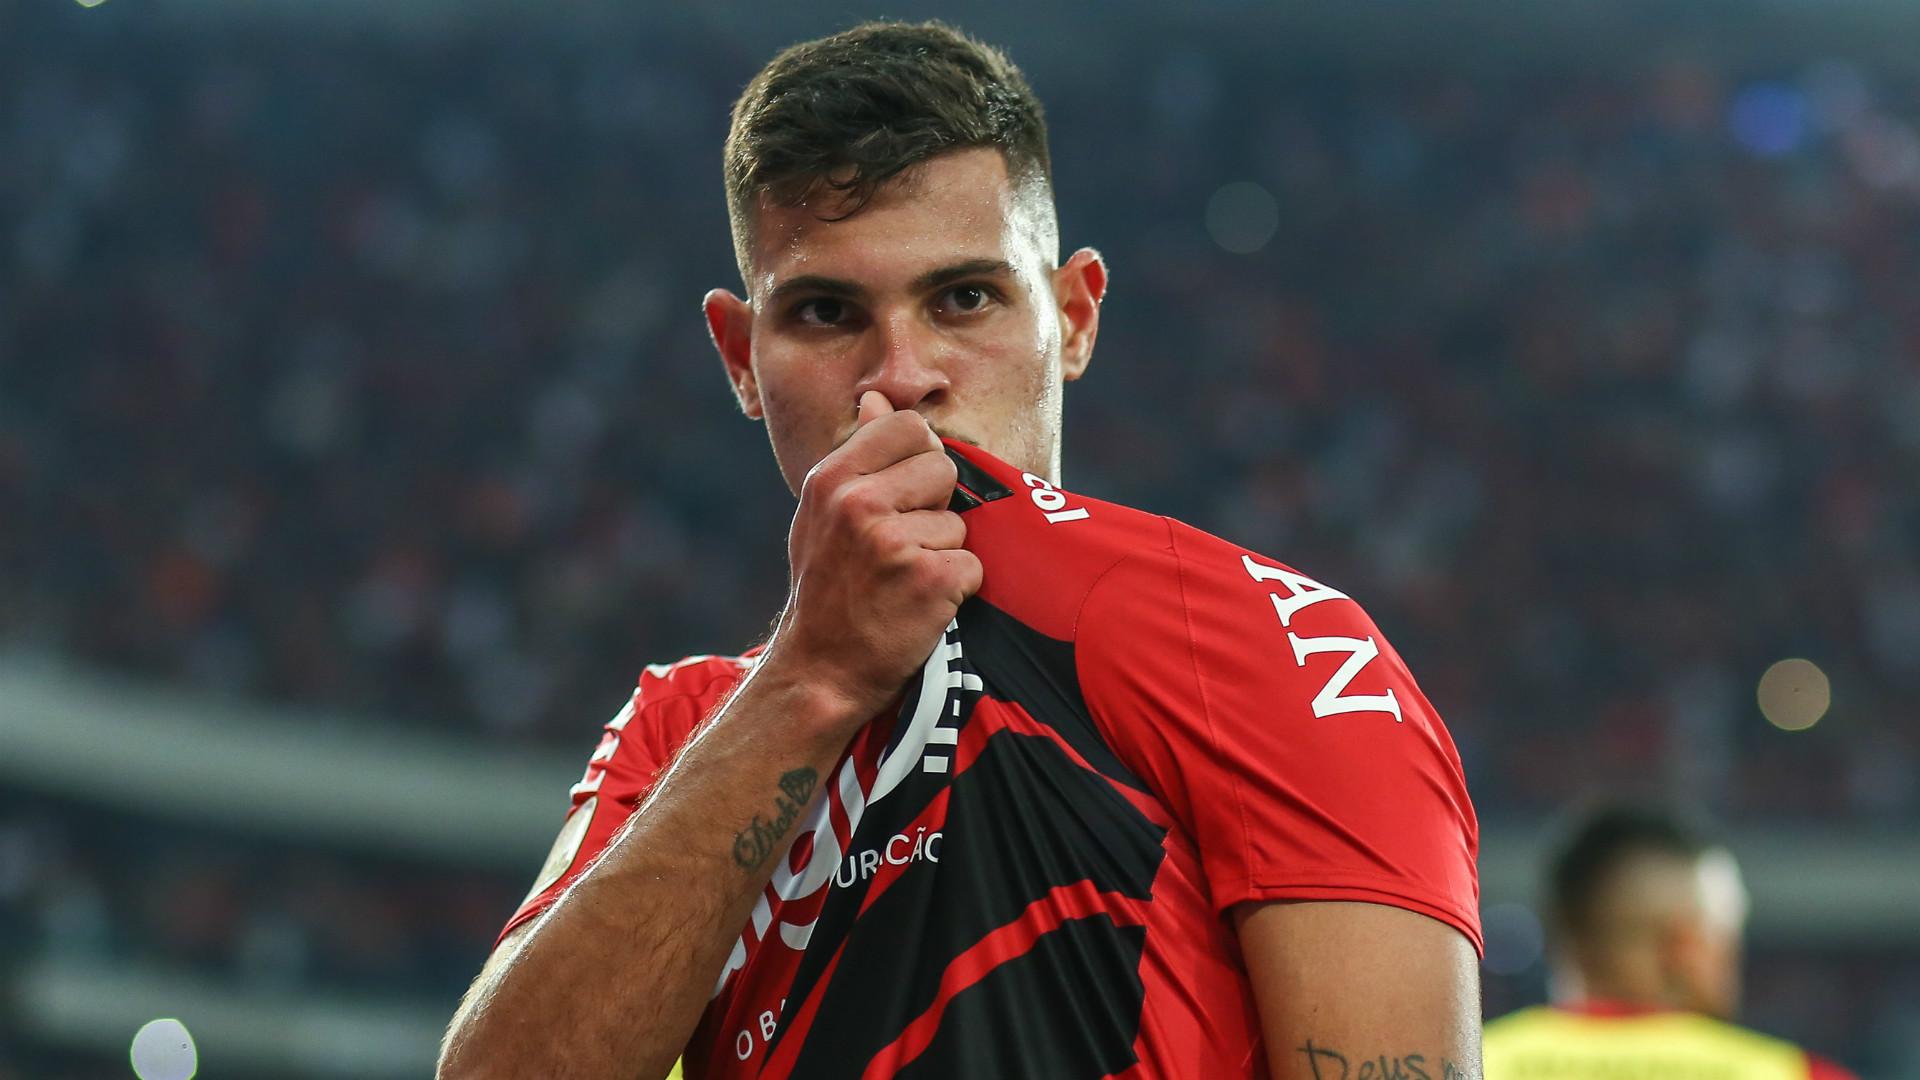 Bruno Guimaraes to Arsenal: Edu in talks over £25.7m transfer, player responds to Benfica - Bóng Đá